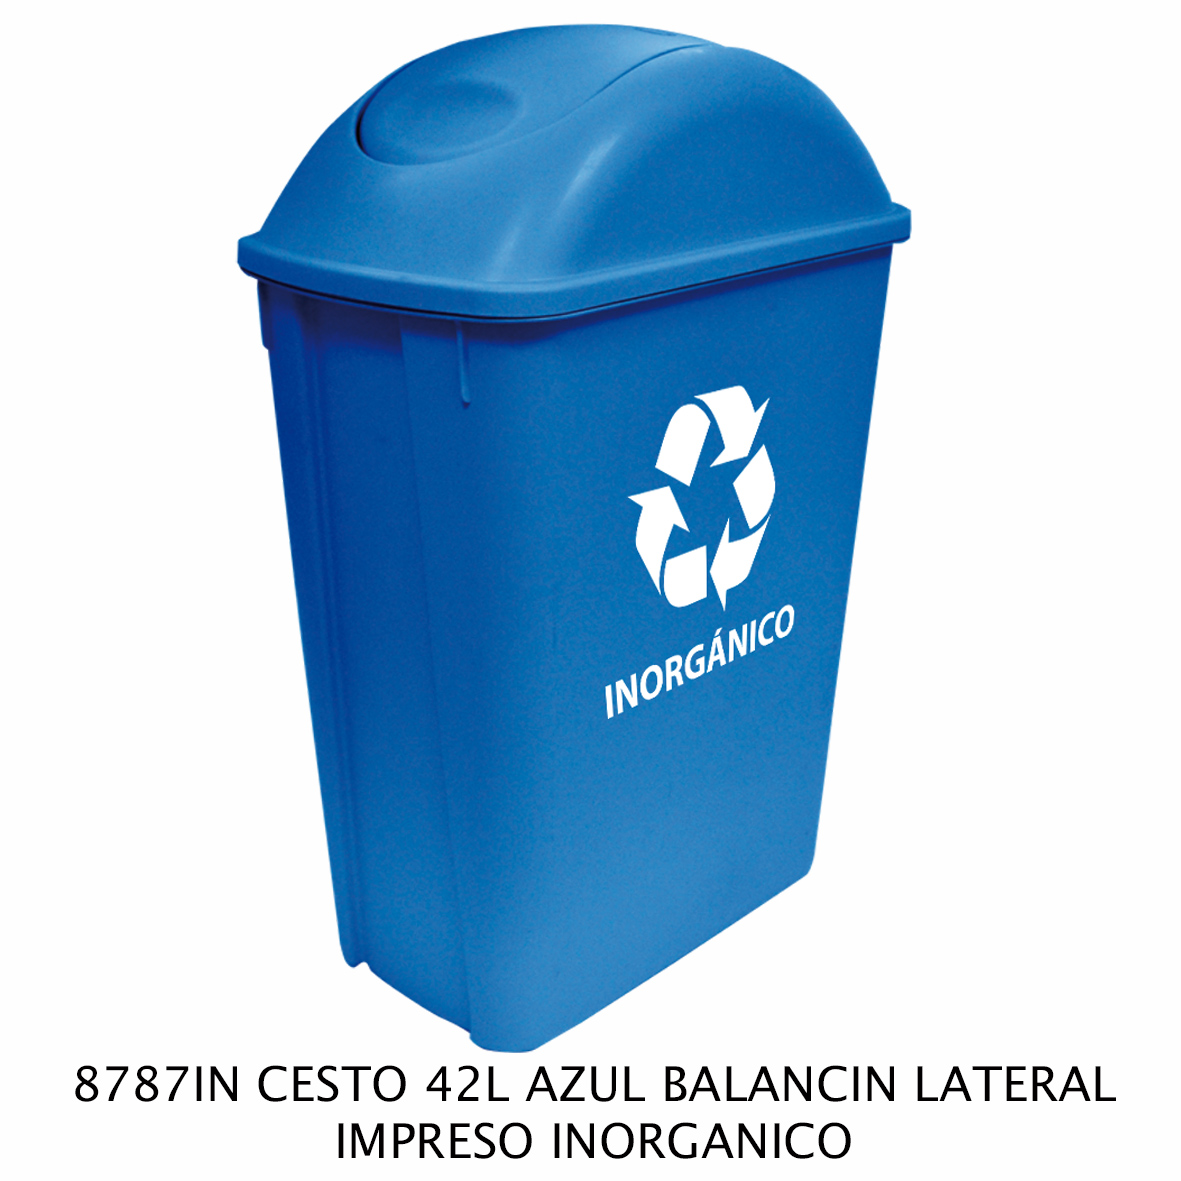 Bote de basura mediano de 42 litros con balancín lateral color azul modelo 8787IN impreso inorgánico de Sablón